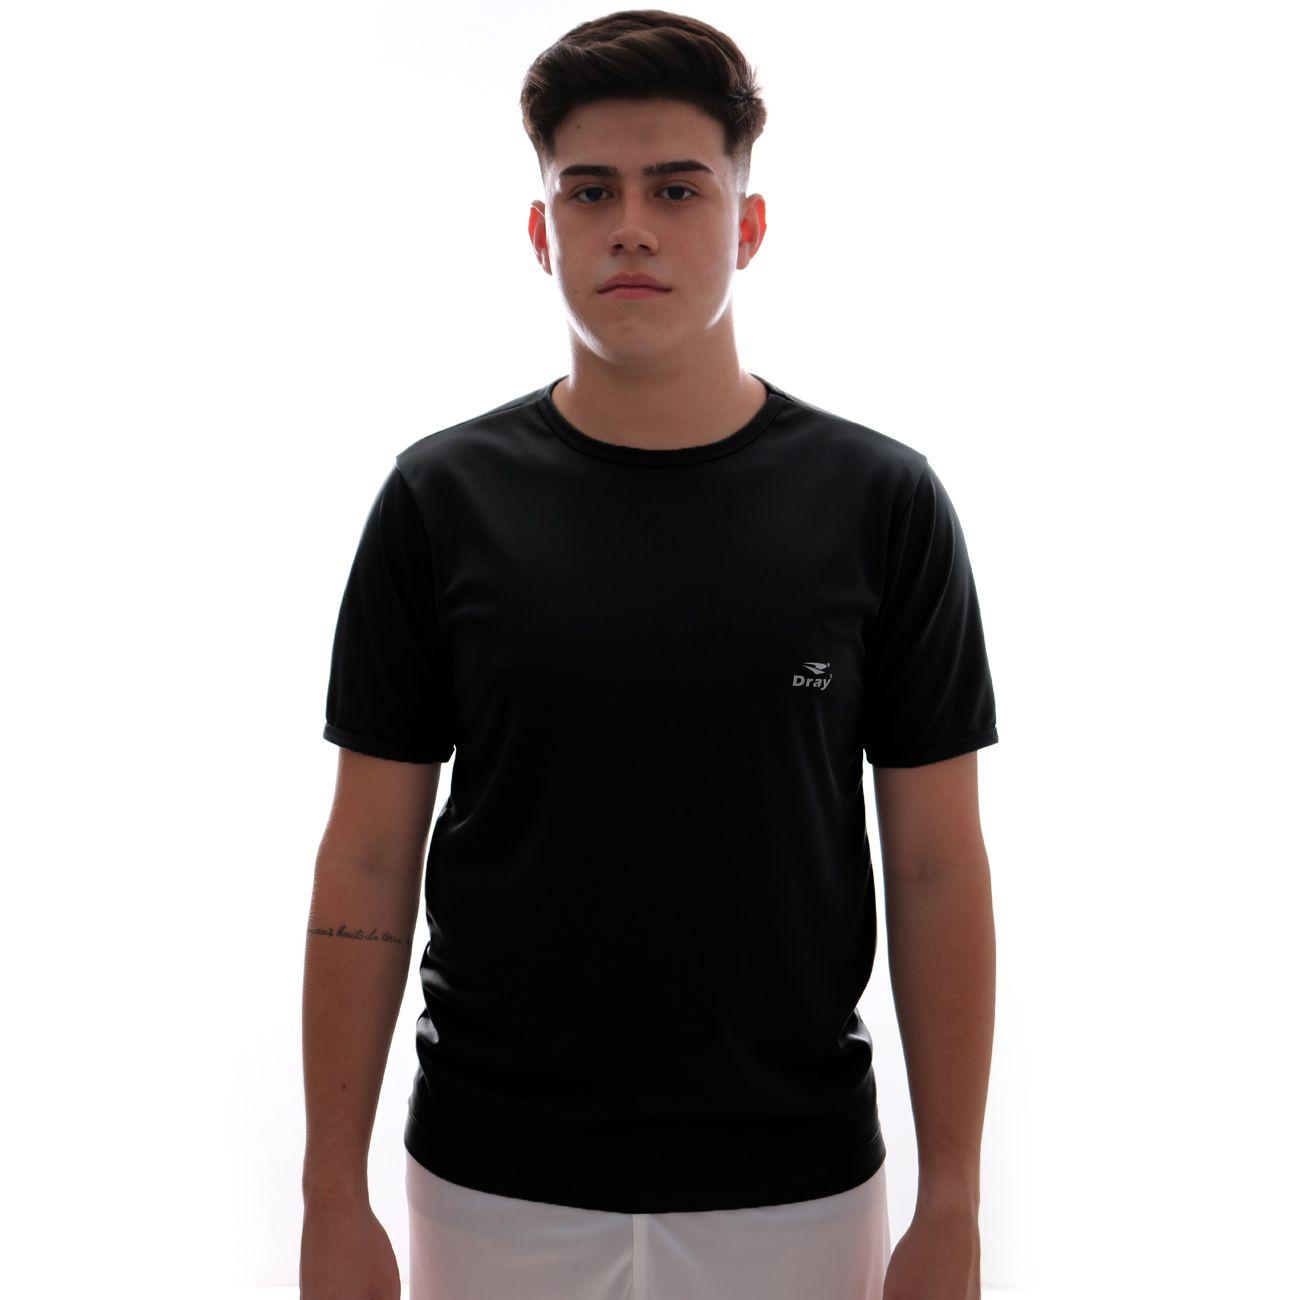 Camisa Dray Basic Preto